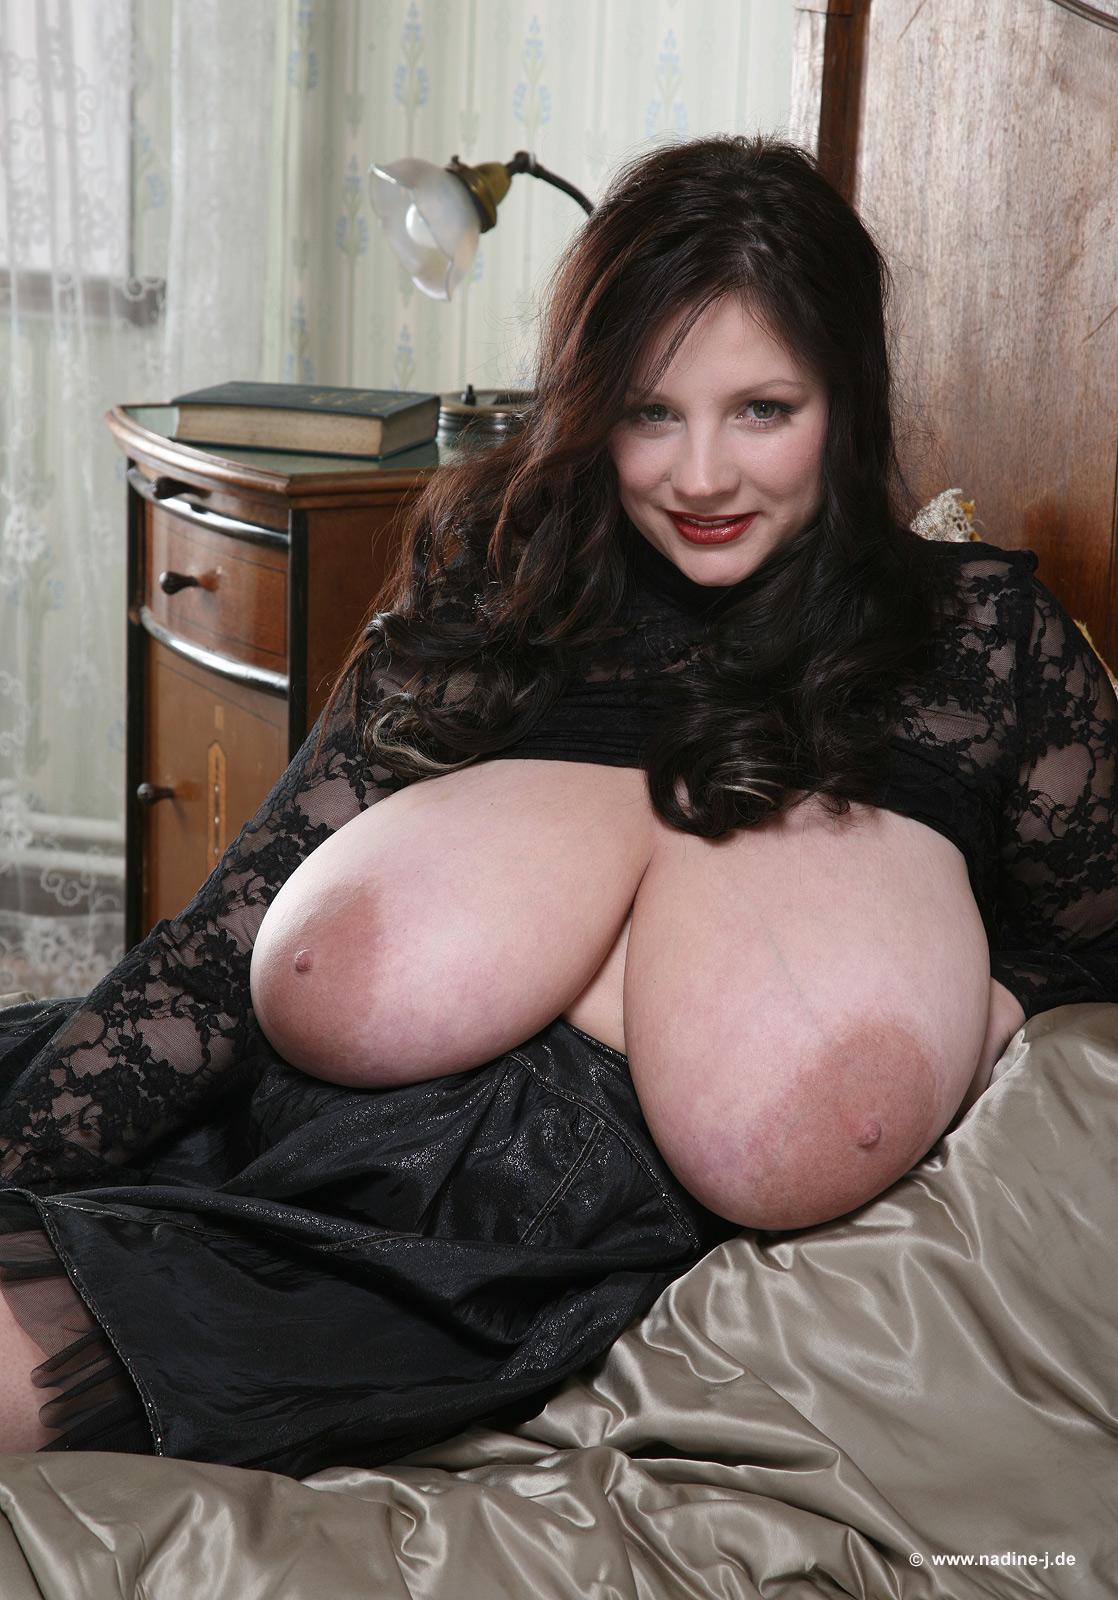 Nadine jansen busty